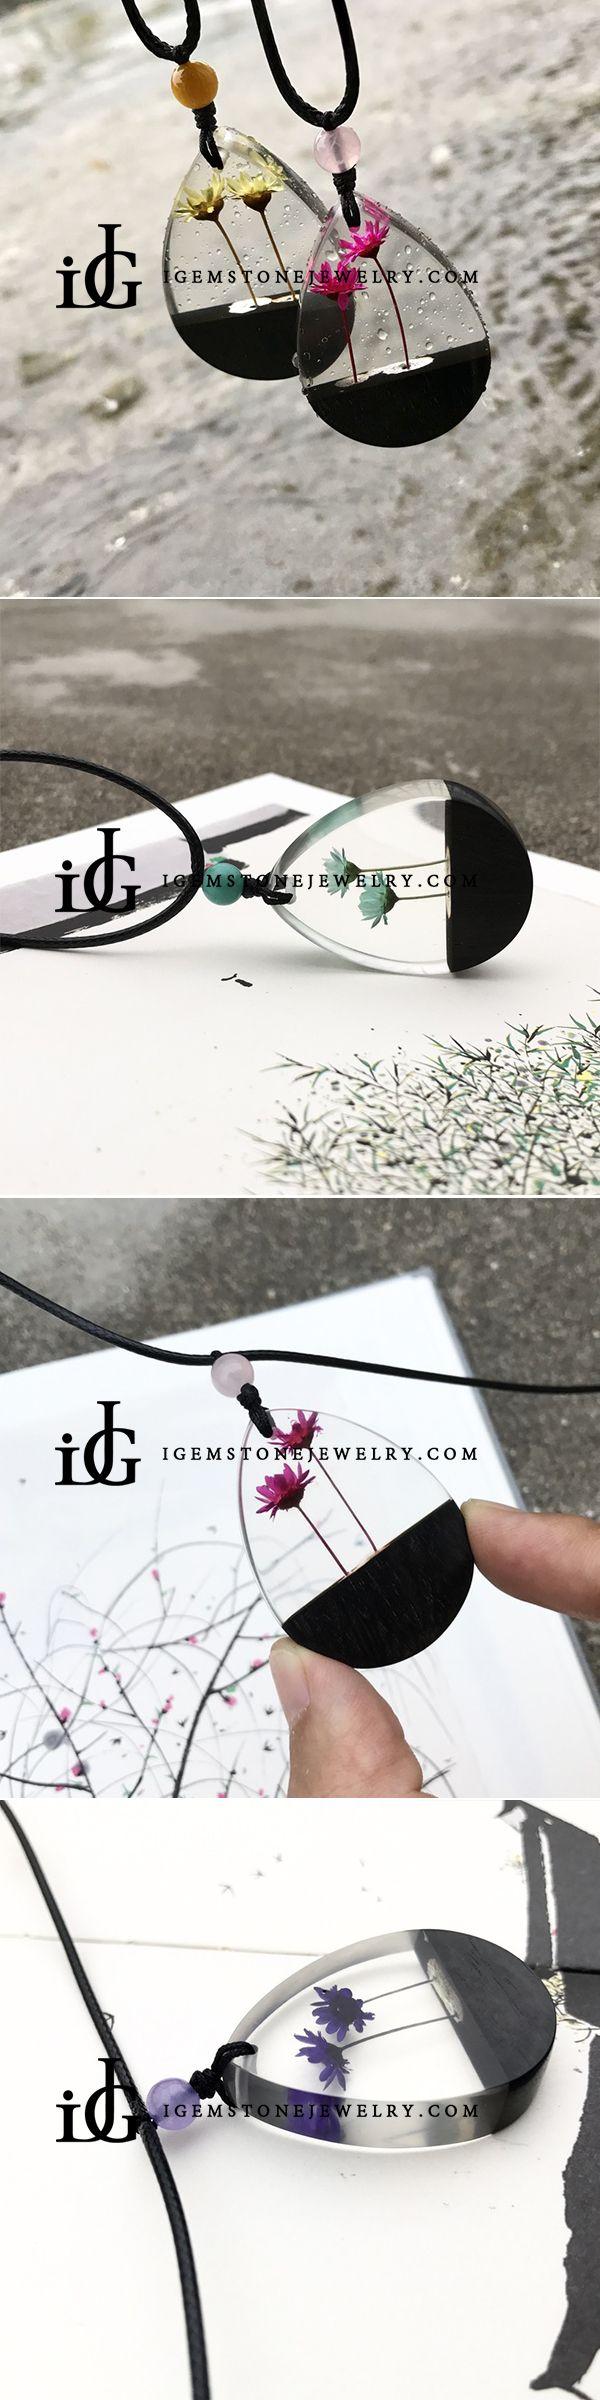 Herbage Resin Wood Pendant Necklace Handmade Jewelry Gift Women